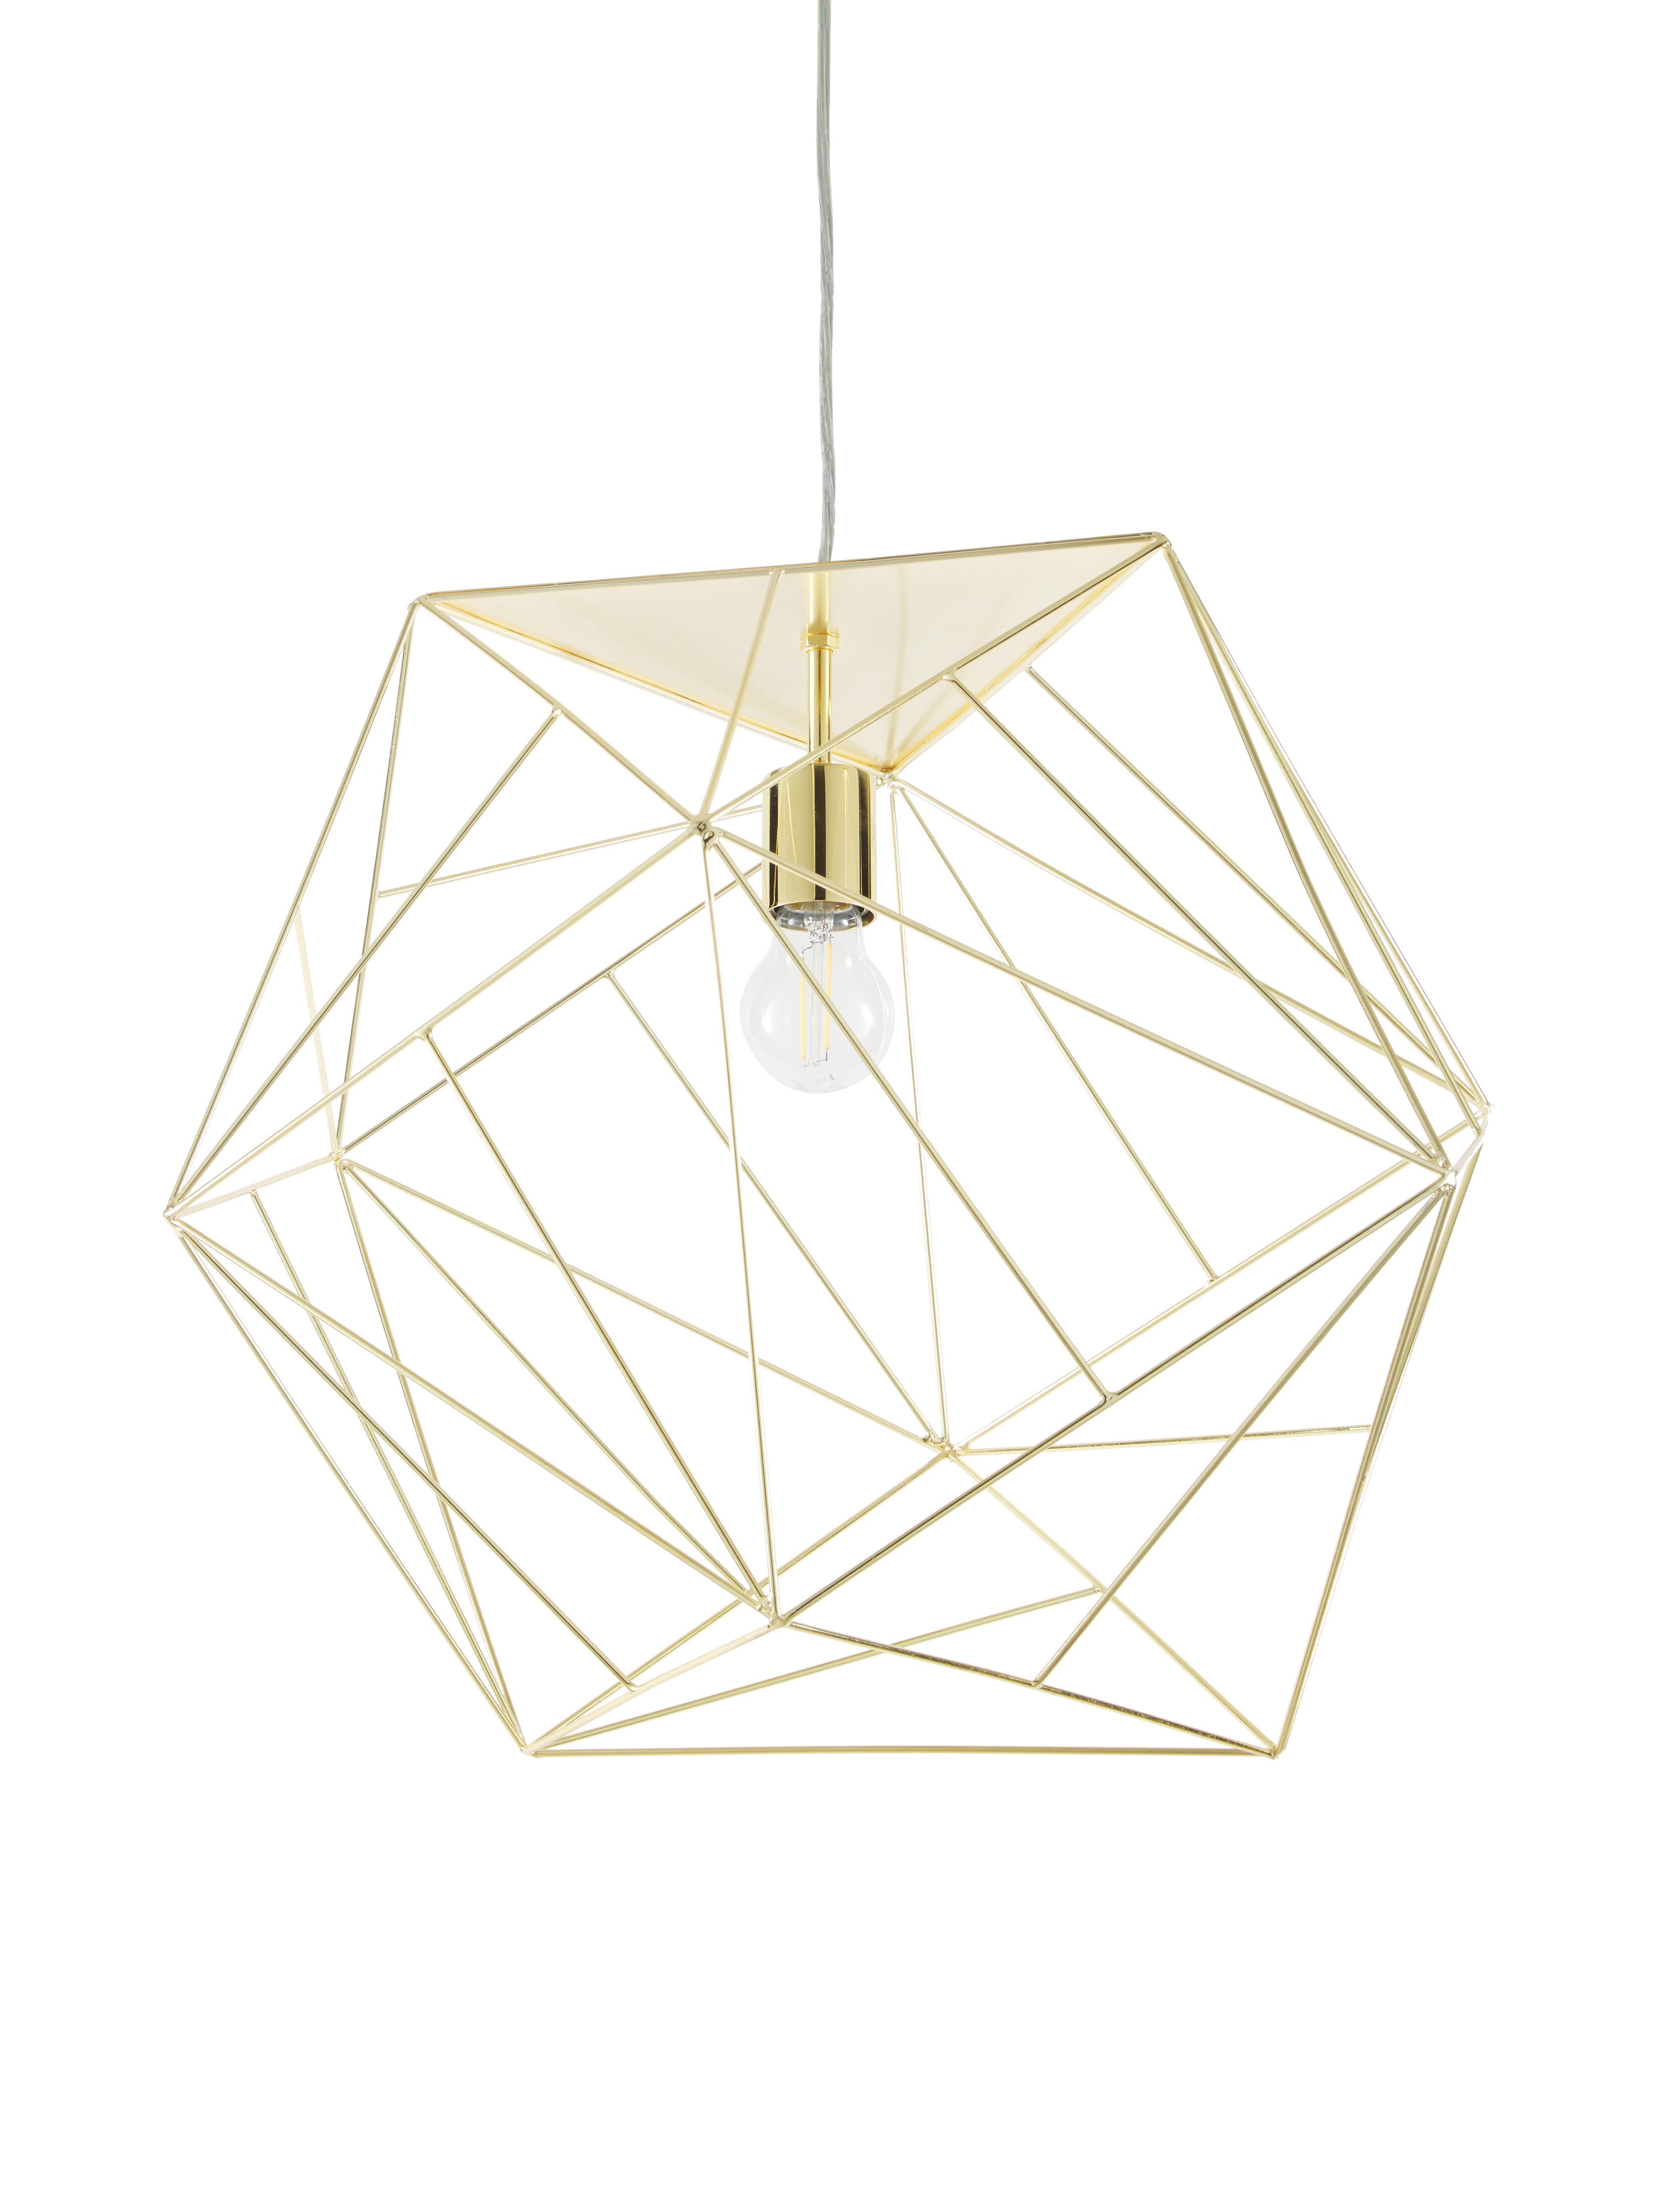 Grote hanglamp Cape Town, Lampenkap: vermessingd edelstaal, Messingkleurig, Ø 51 x H 45 cm